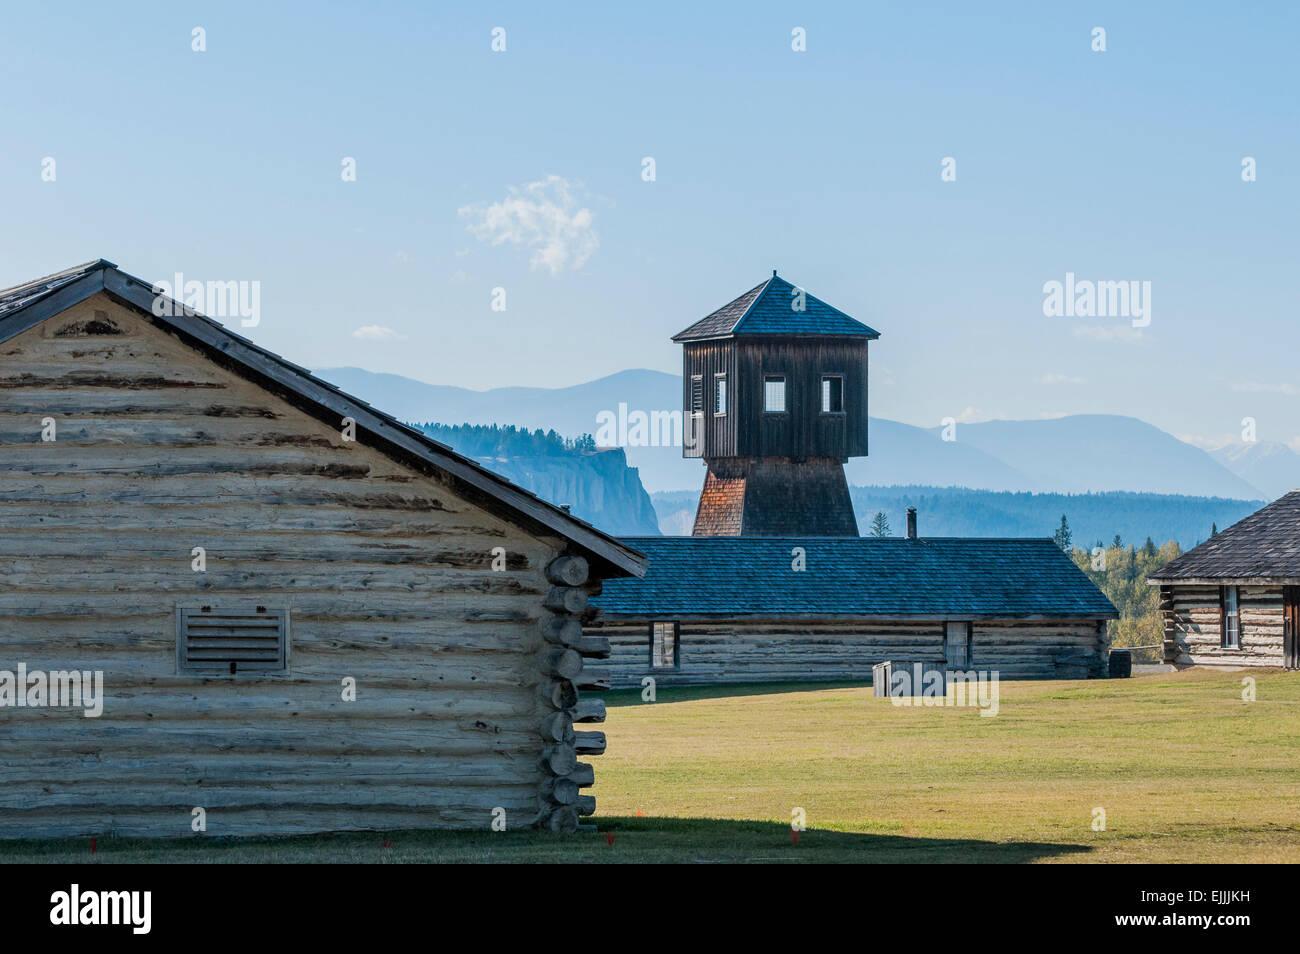 Log cabins, N.W.M.P, Kootenay Post, Fort Steele Heritage Town,  Kootenay Region, British Columbia, Canada - Stock Image